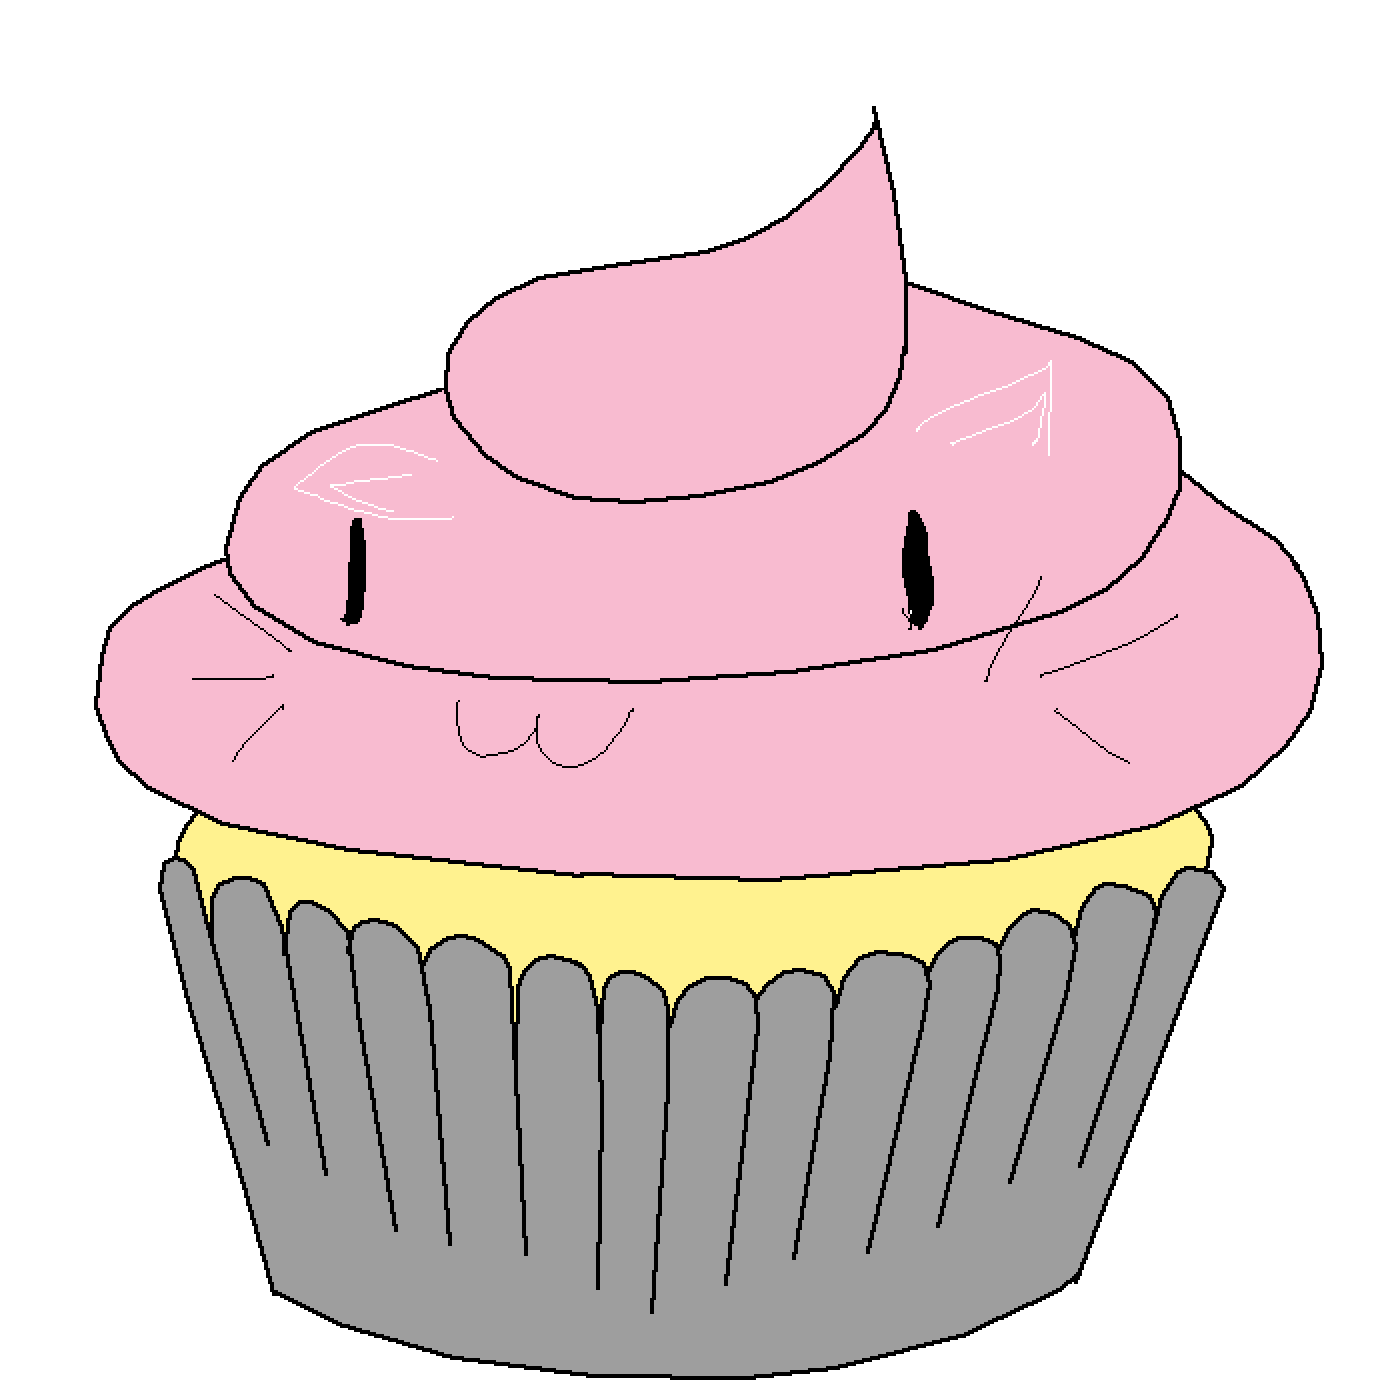 Tumblr cupcake clipart clipart royalty free download Cupcake Clip art Buttercream Portable Network Graphics ... clipart royalty free download